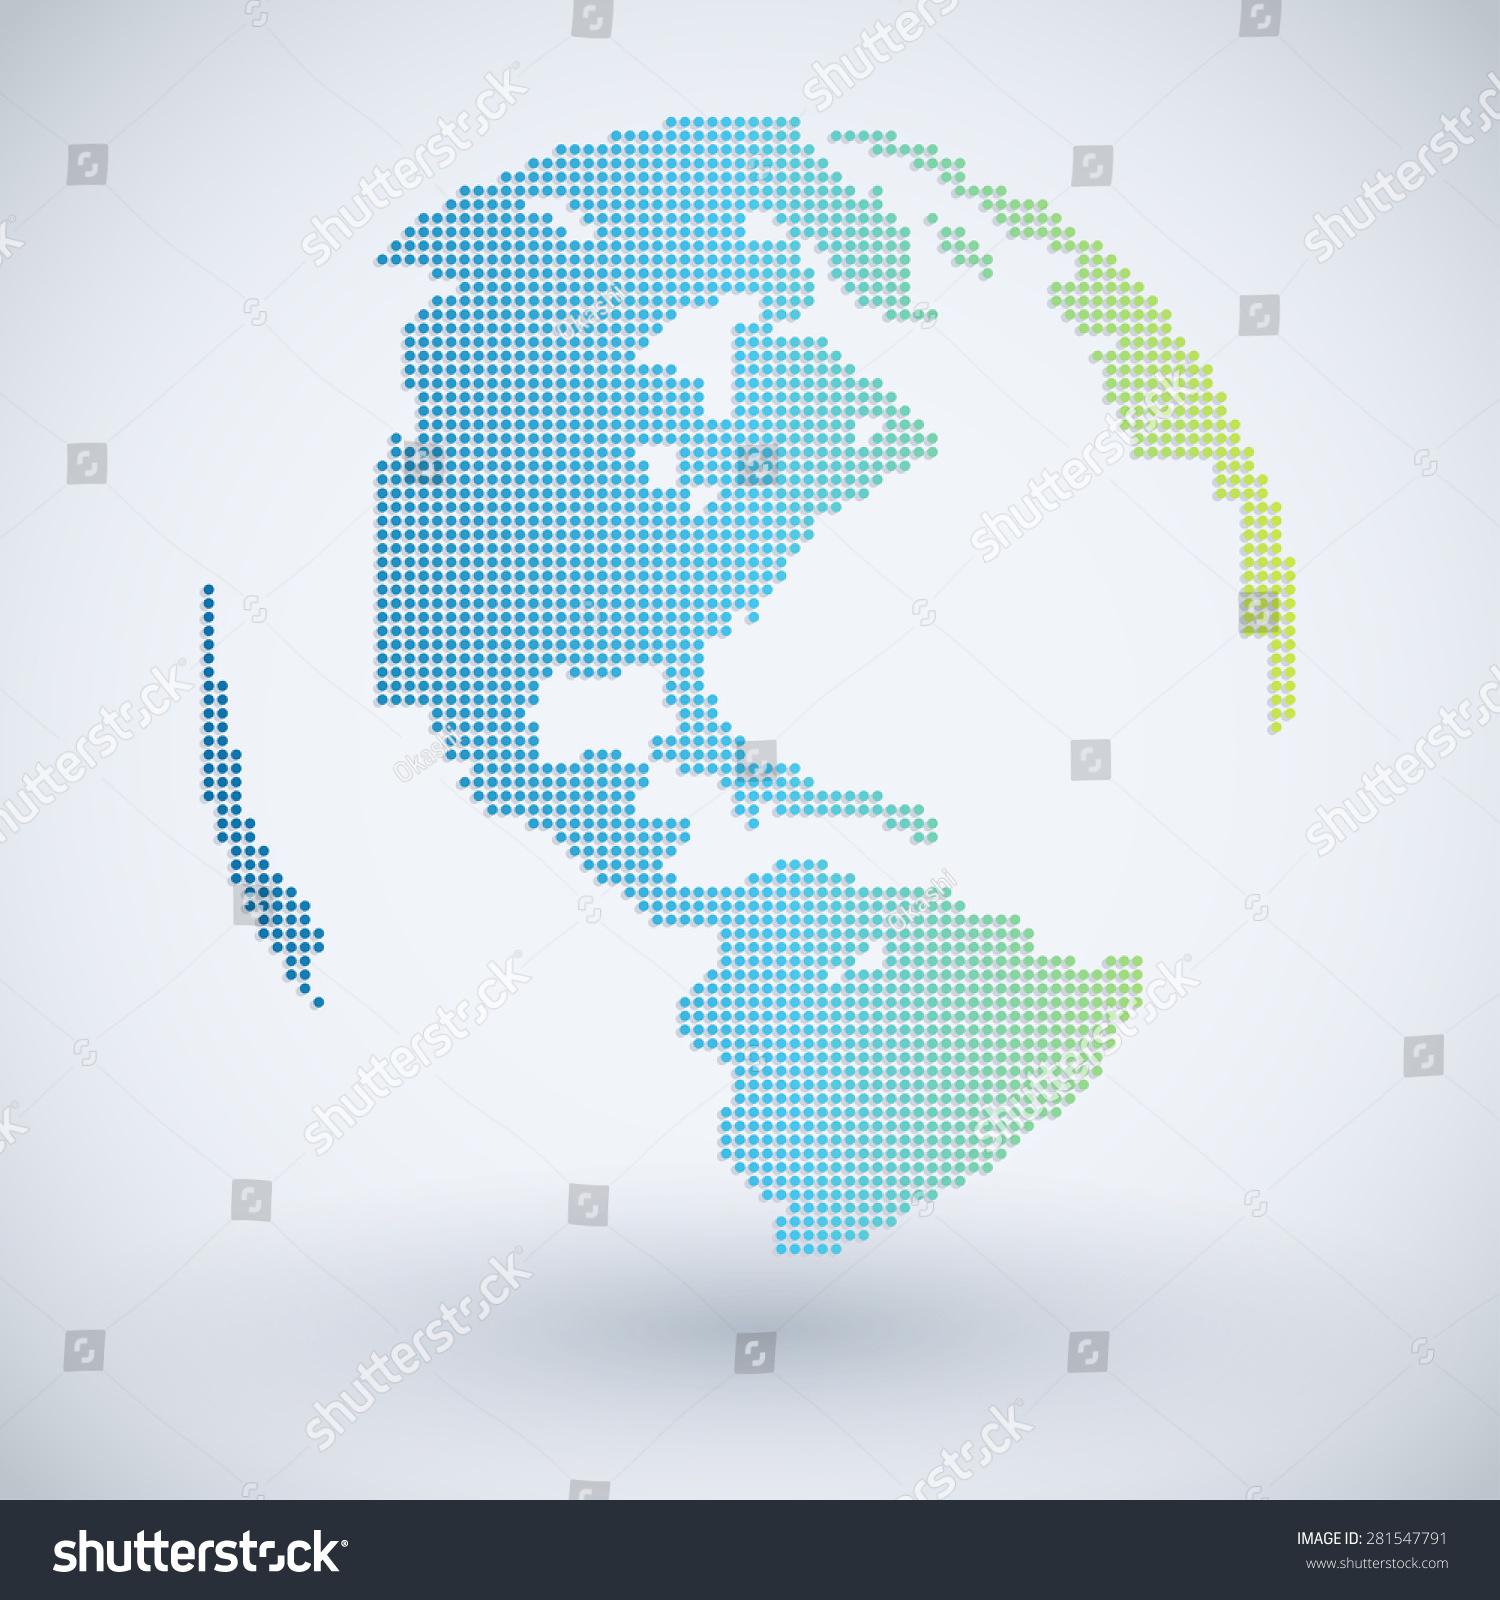 World map pixel on white background stock vector hd royalty free world map in pixel on white background vector illustration gumiabroncs Choice Image